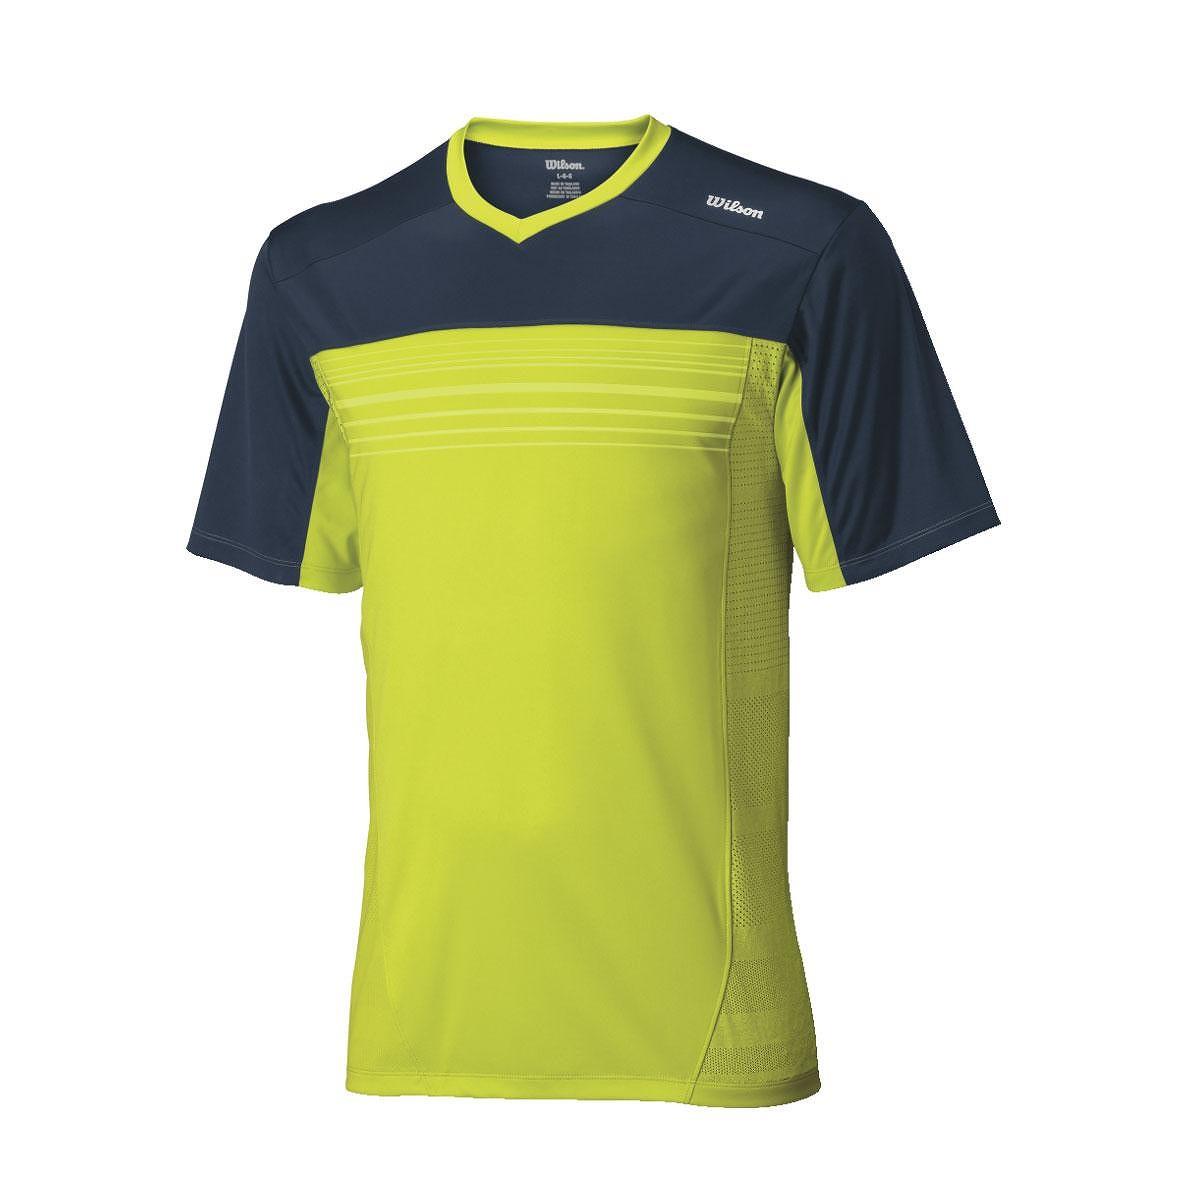 Áo Tennis Wilson MEN'S EXPLOSIVE CREW - WRA 141606